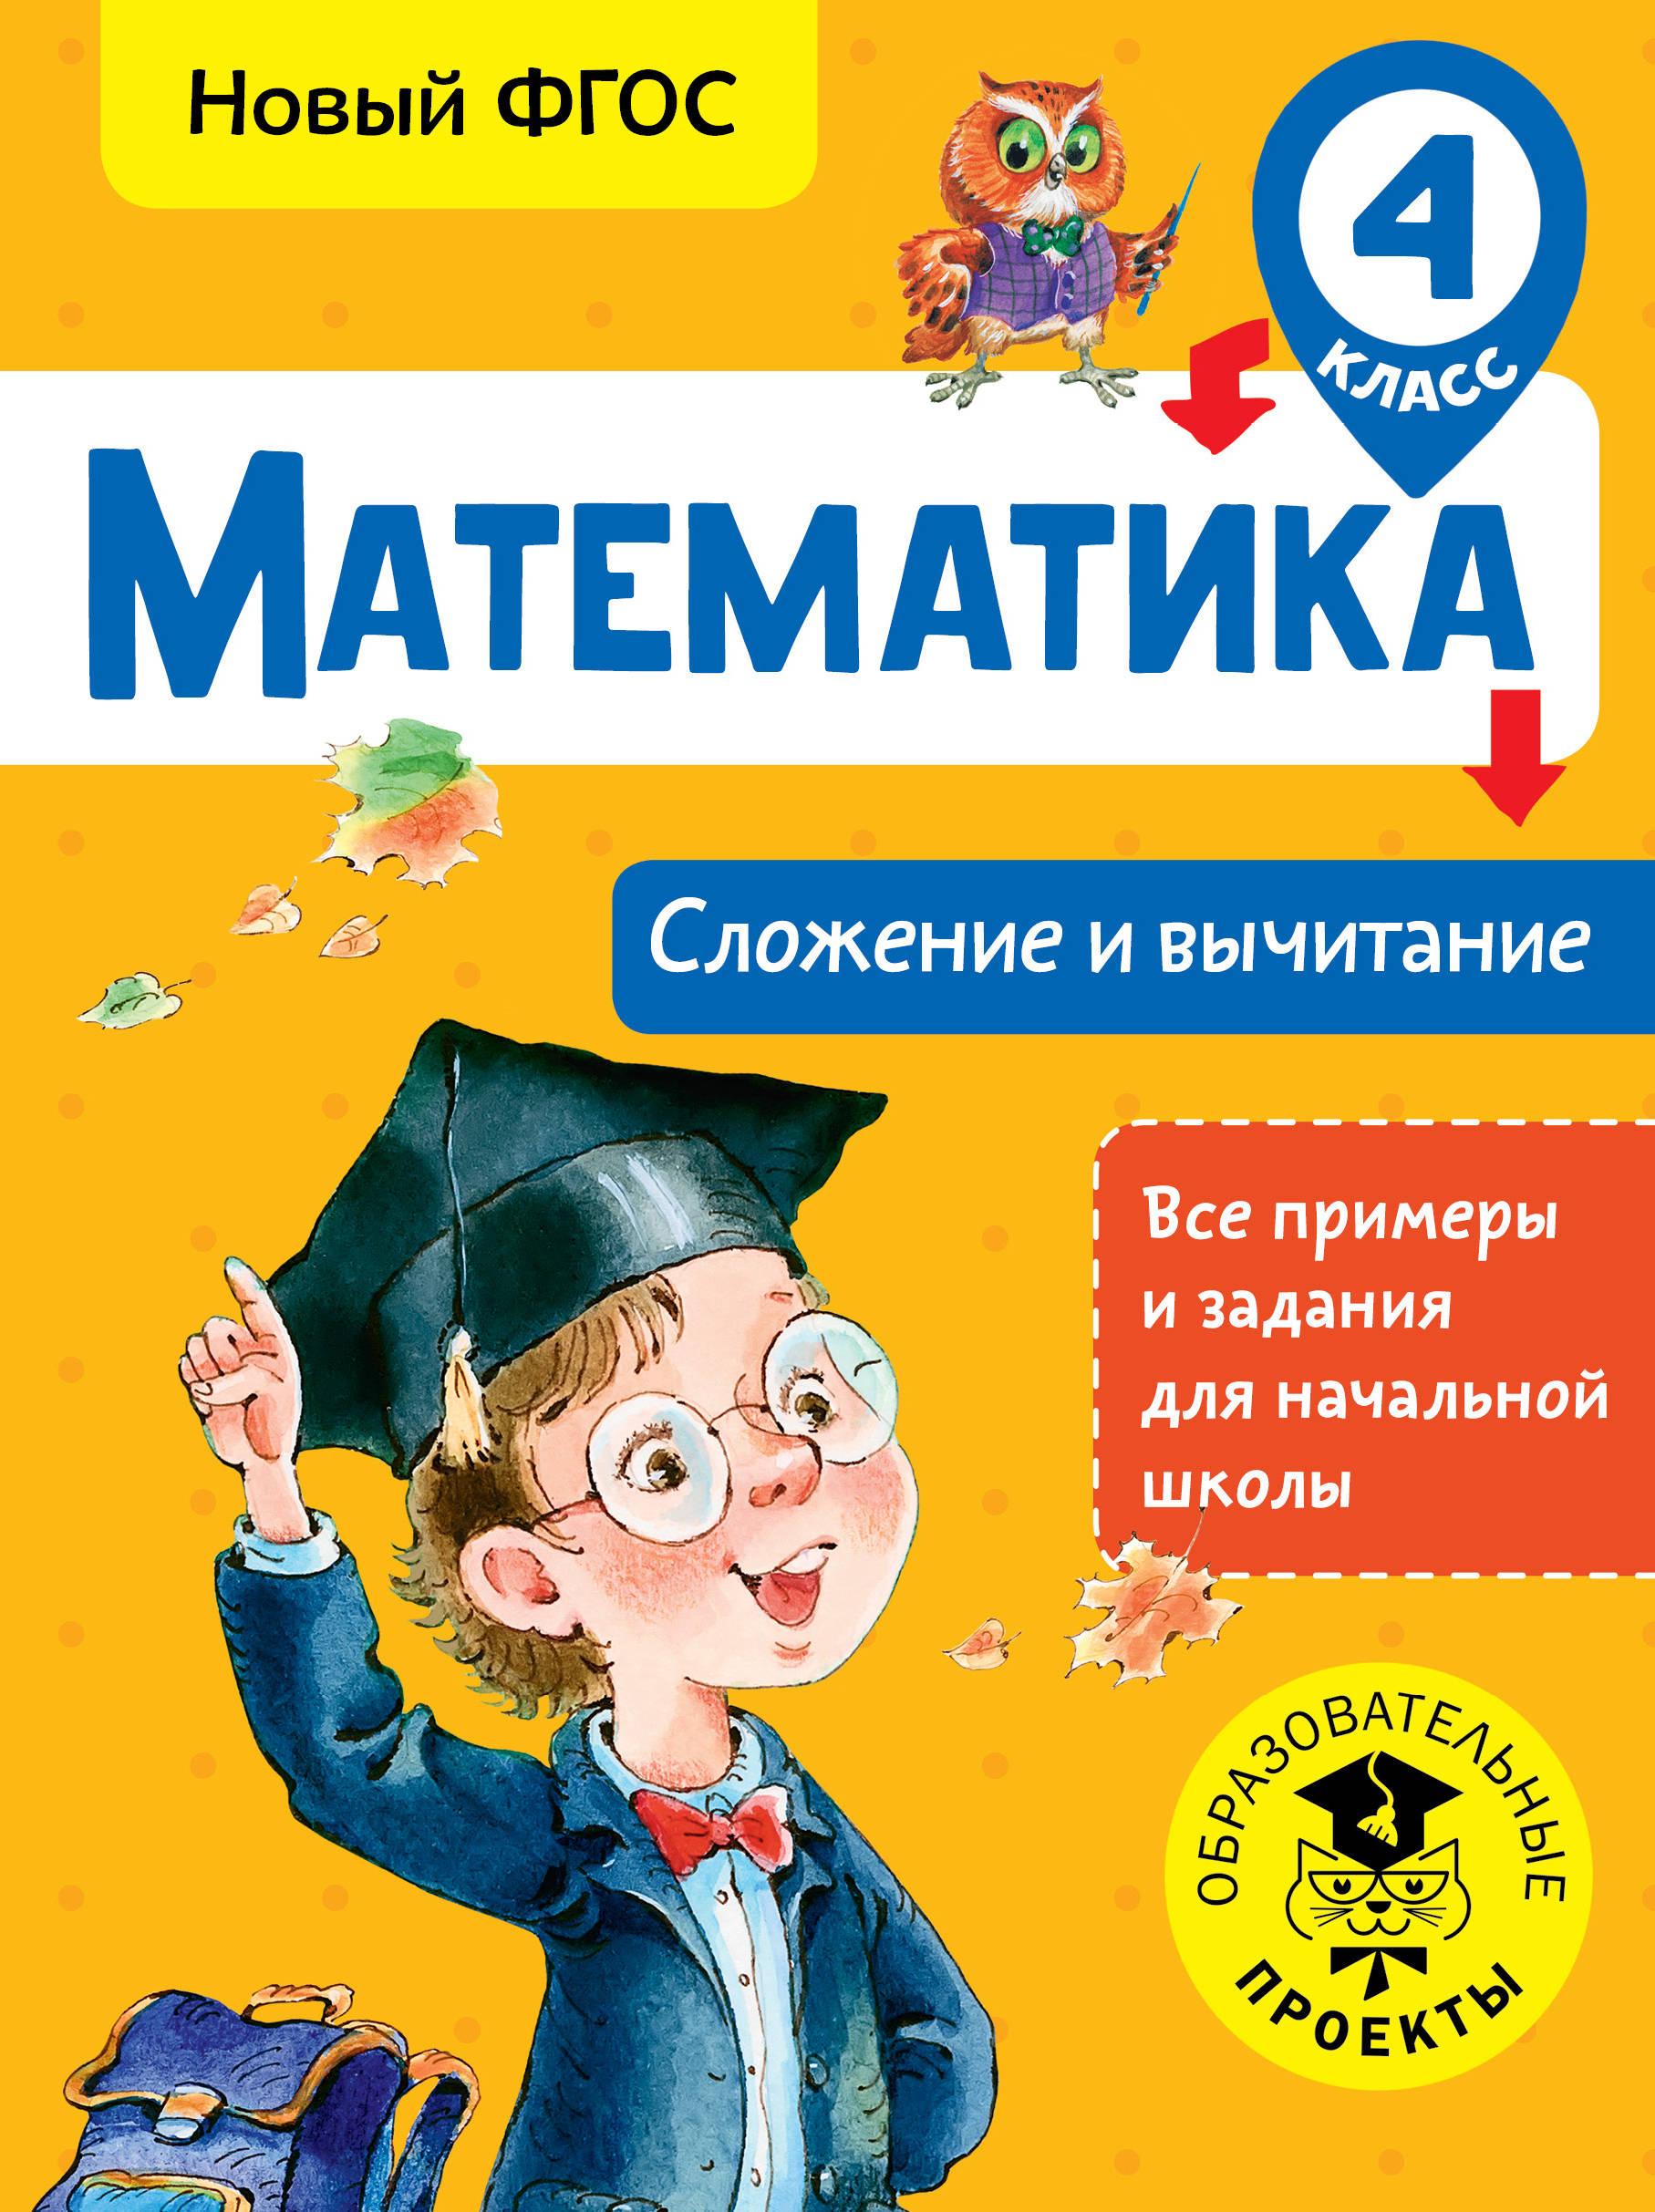 Математика. Сложение и вычитание. 4 класс ( Позднева Т.С.  )